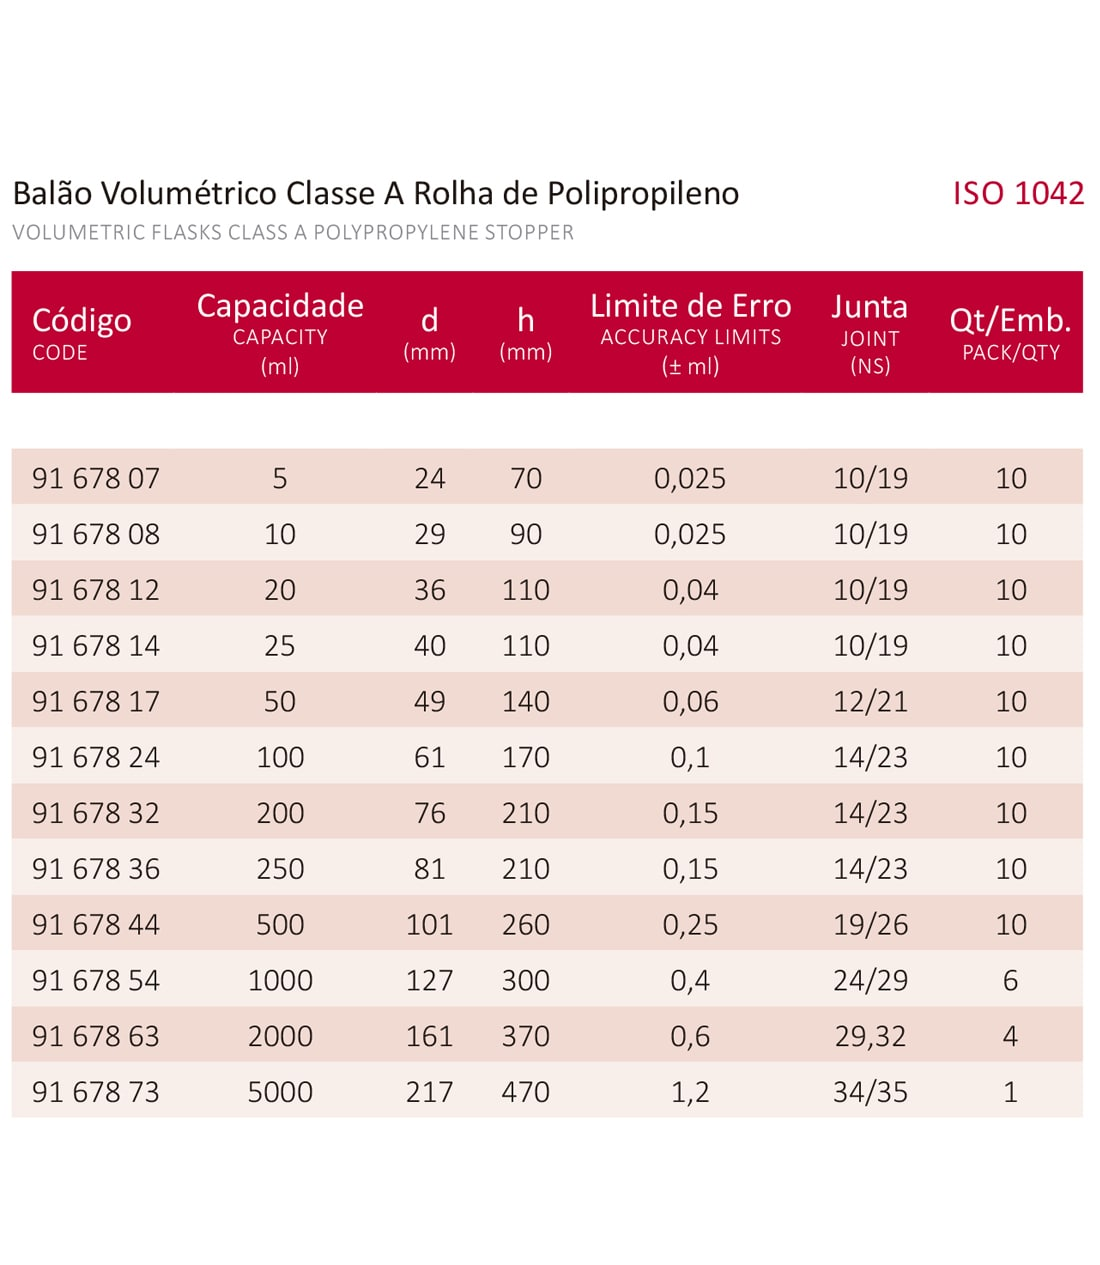 BALÃO VOLUMÉTRICO CLASSE A ROLHA POLI C/ CERTIFICADO RBC 150 ML - Marca Laborglas - Cód. 9167829-R